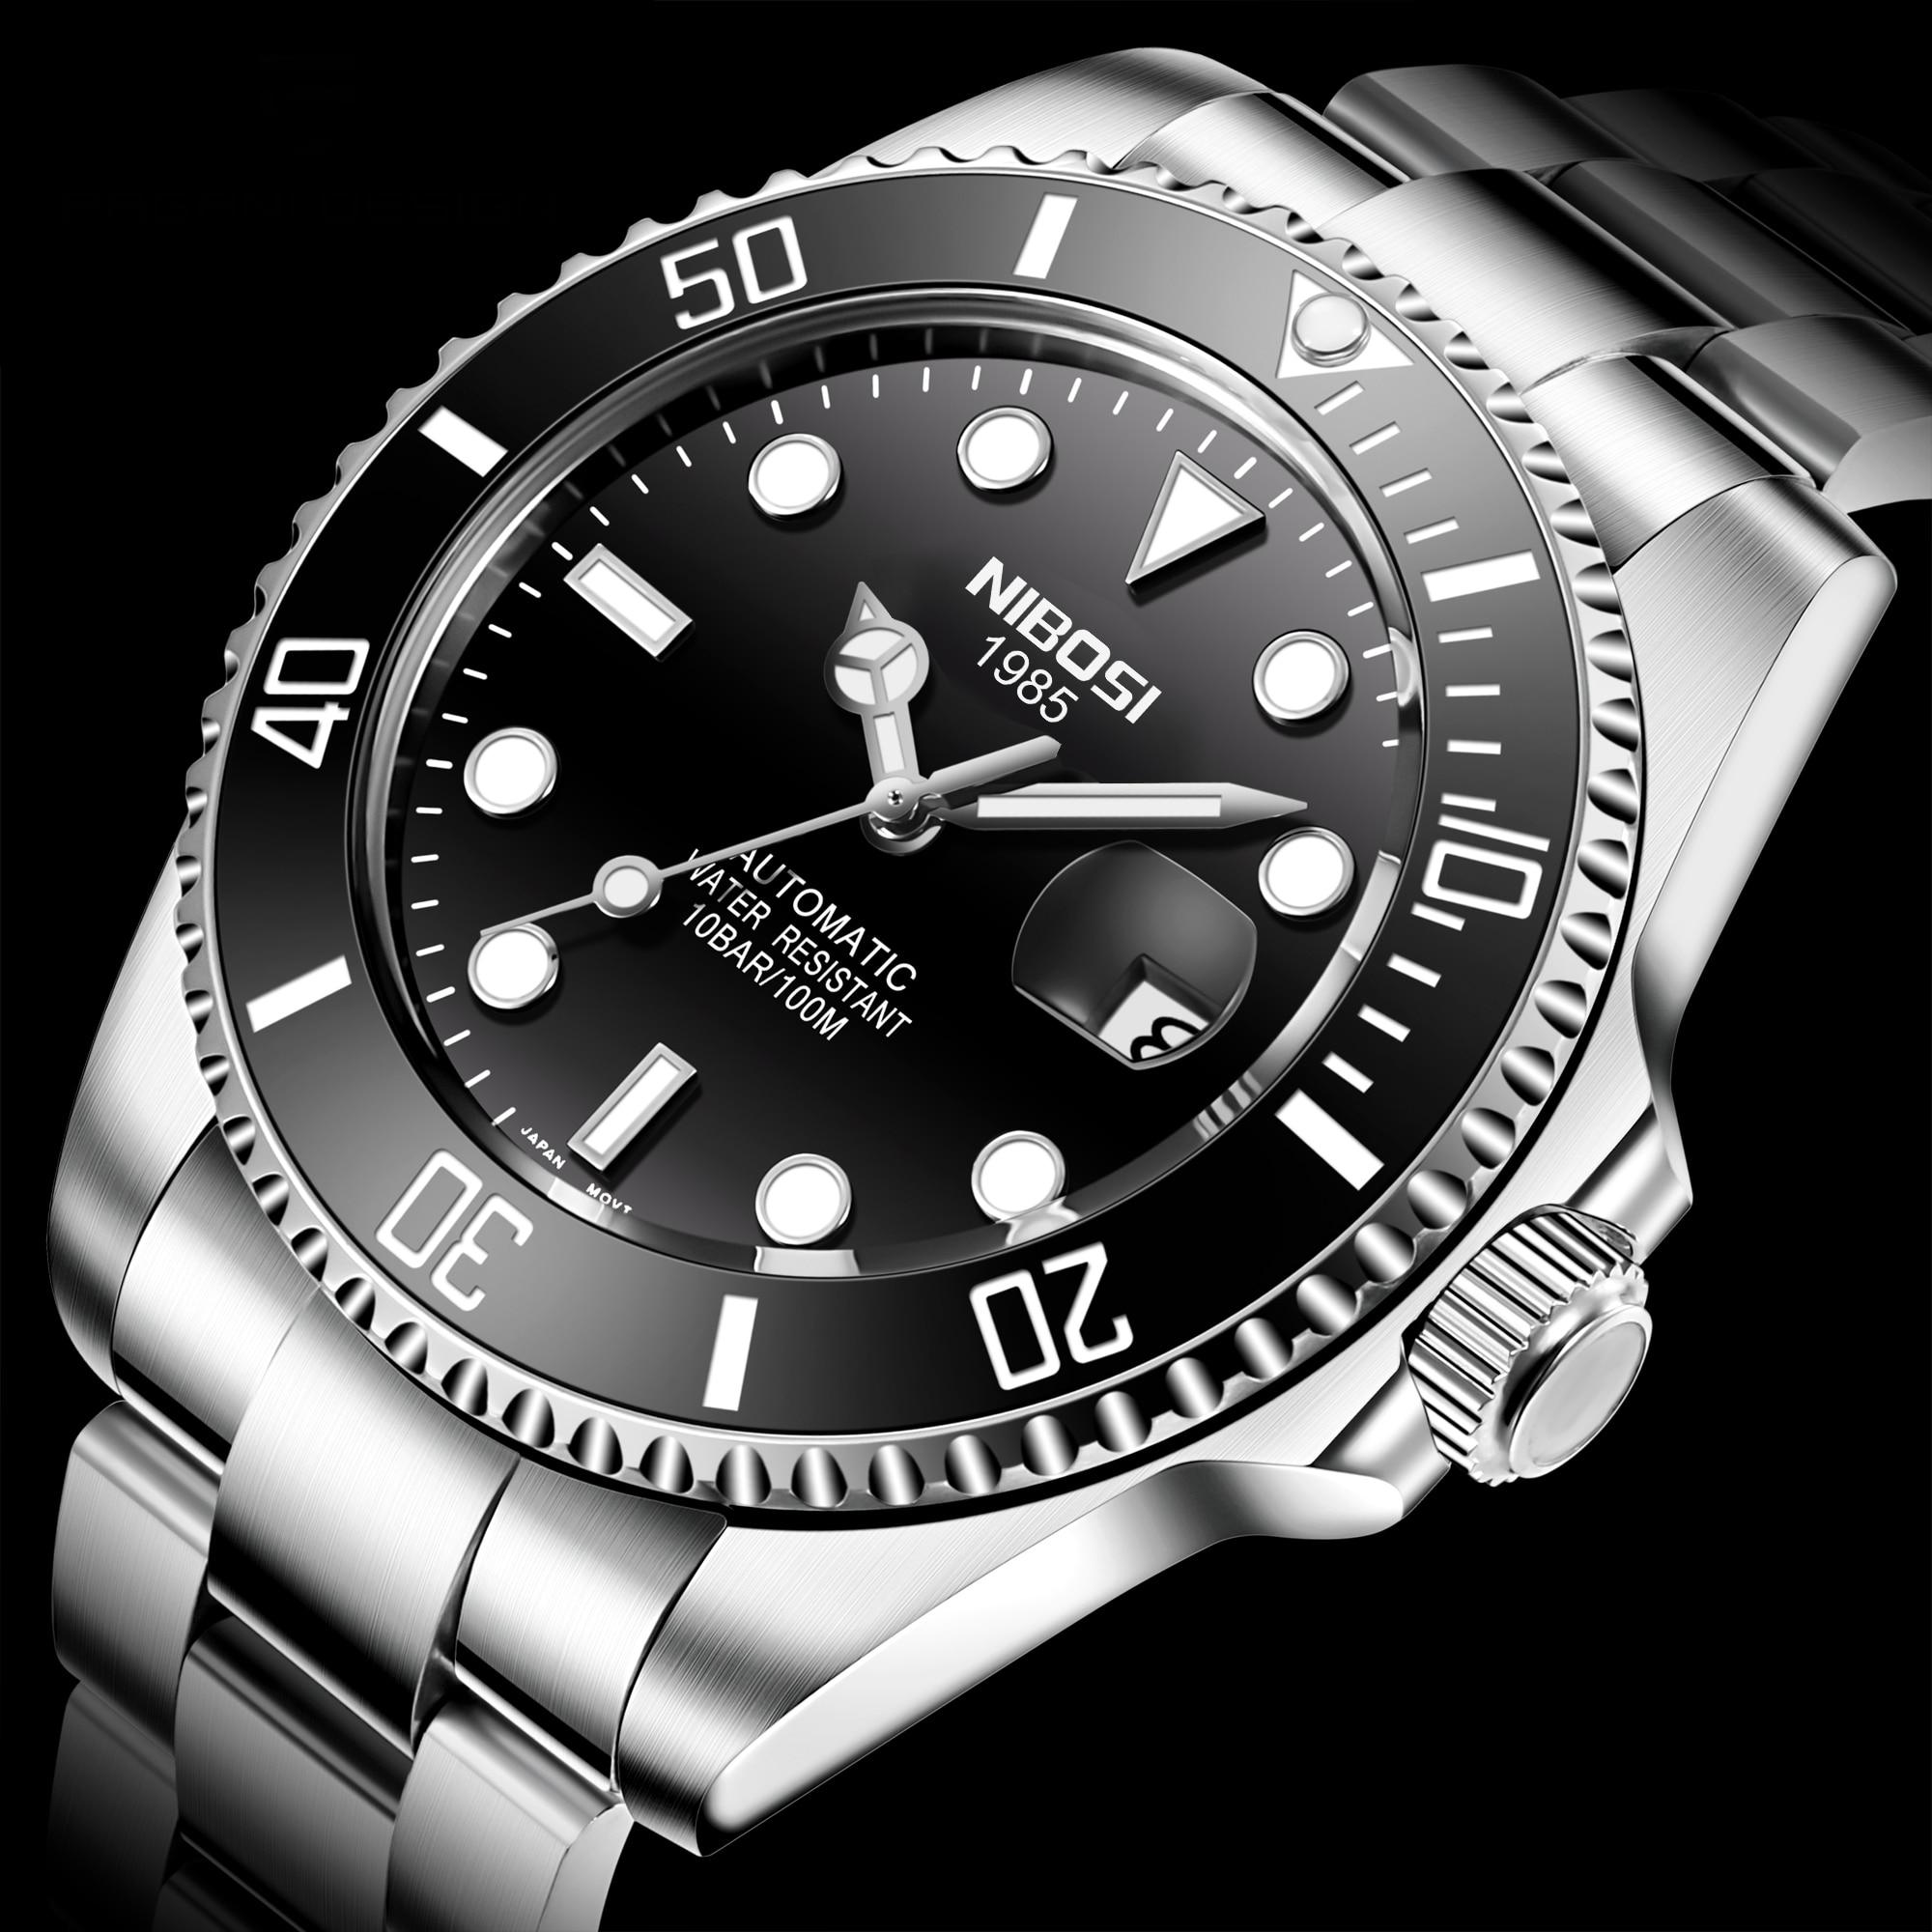 NIBOSI الرجال ساعة أوتوماتيكية الياقوت الفاخرة الميكانيكية ساعة اليد الفولاذ المقاوم للصدأ مقاوم للماء ساعة توربيون Relogio Masculino